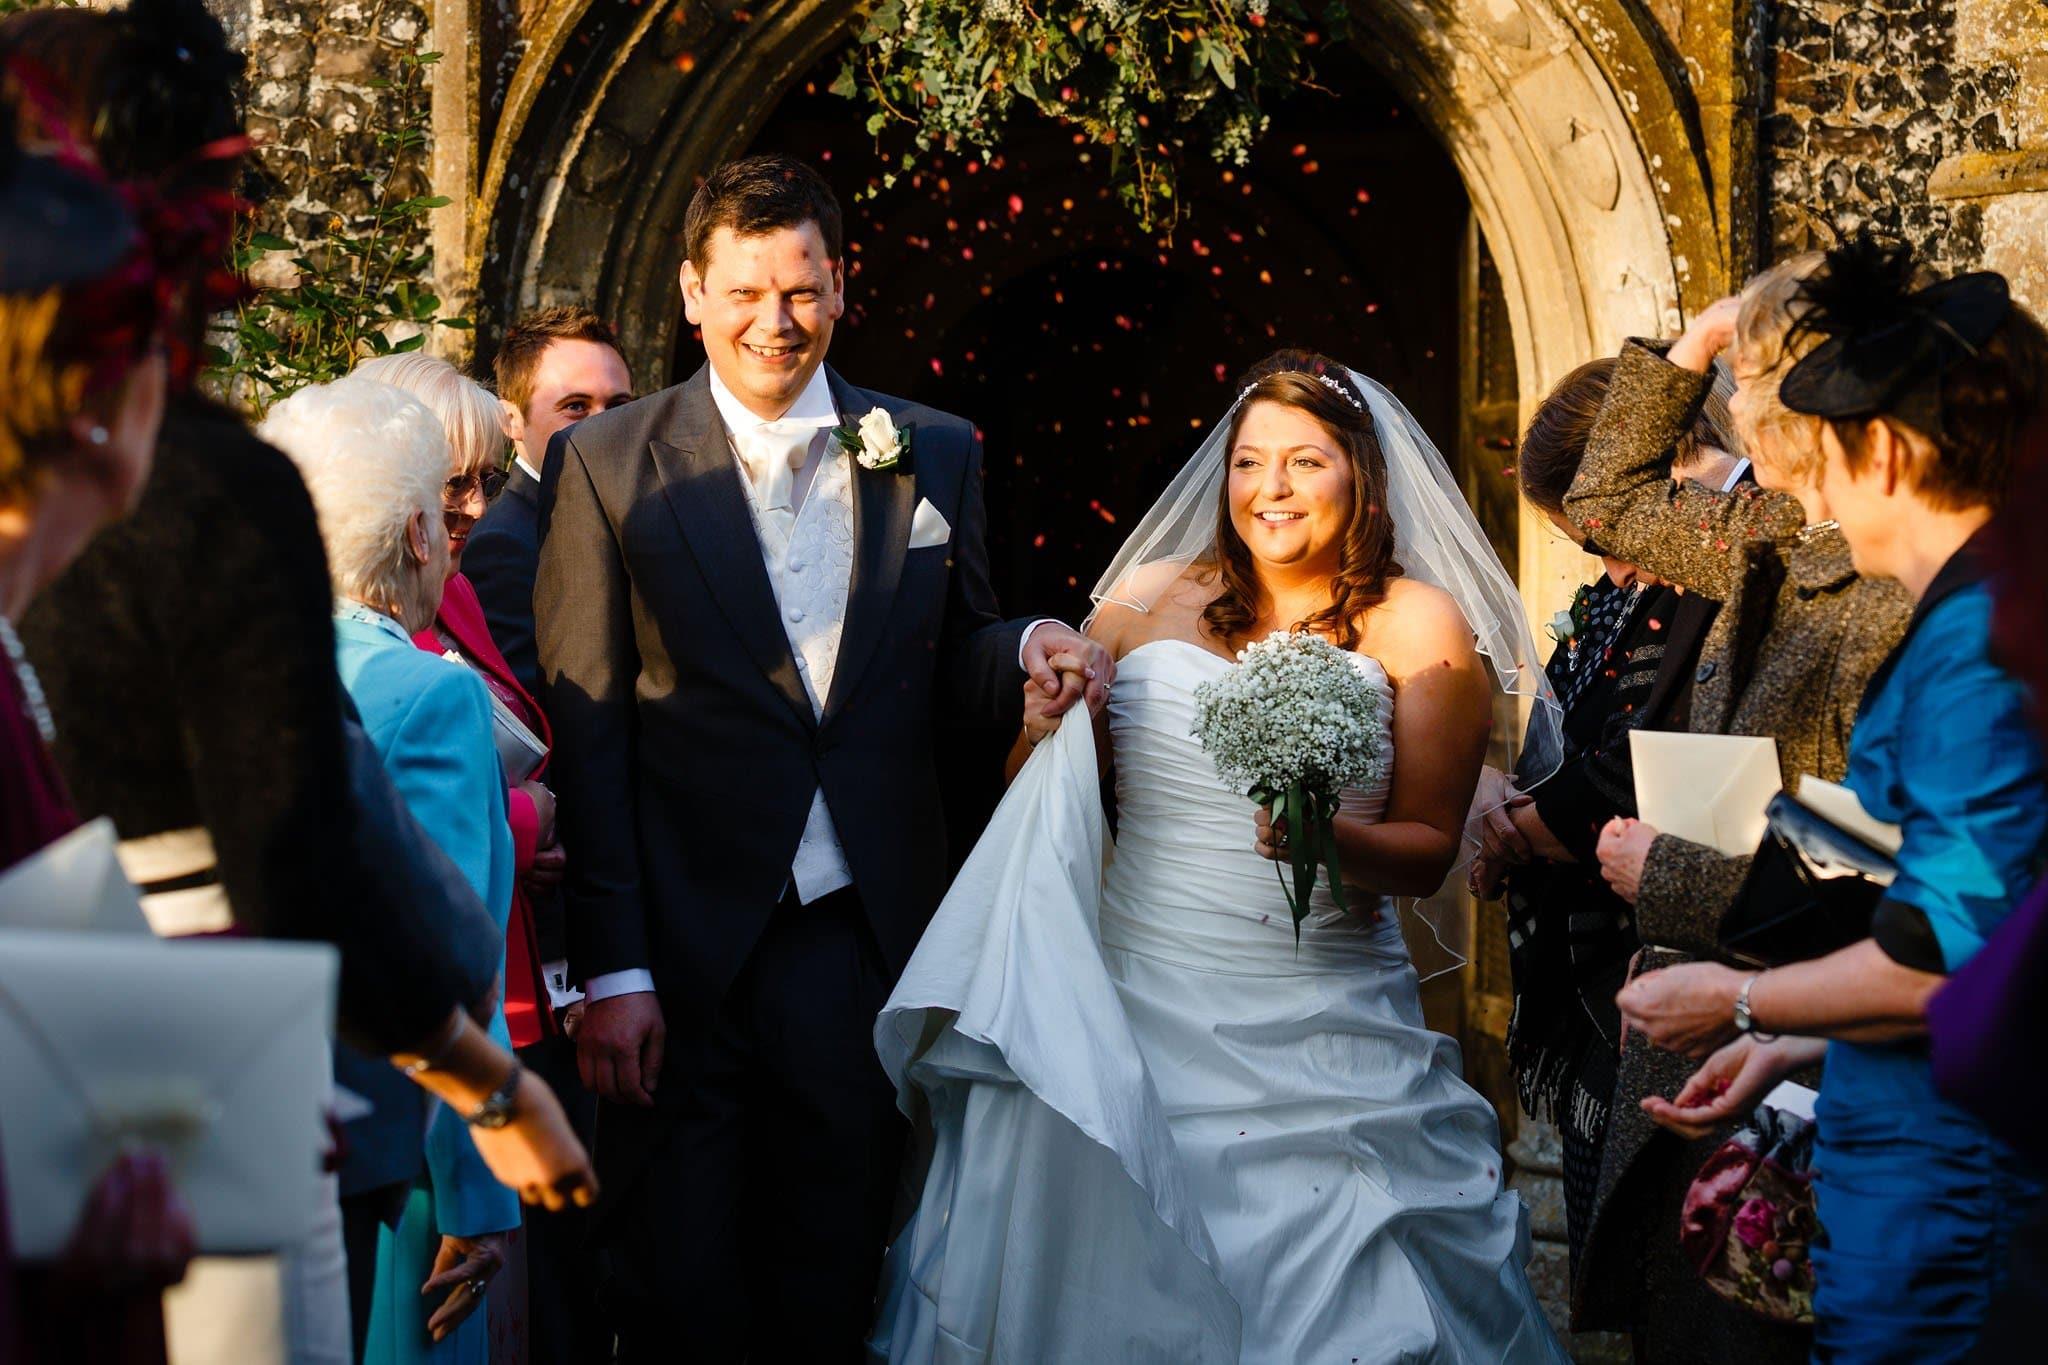 Winter wedding photography at Hengrave Hall of Becky & Kieran